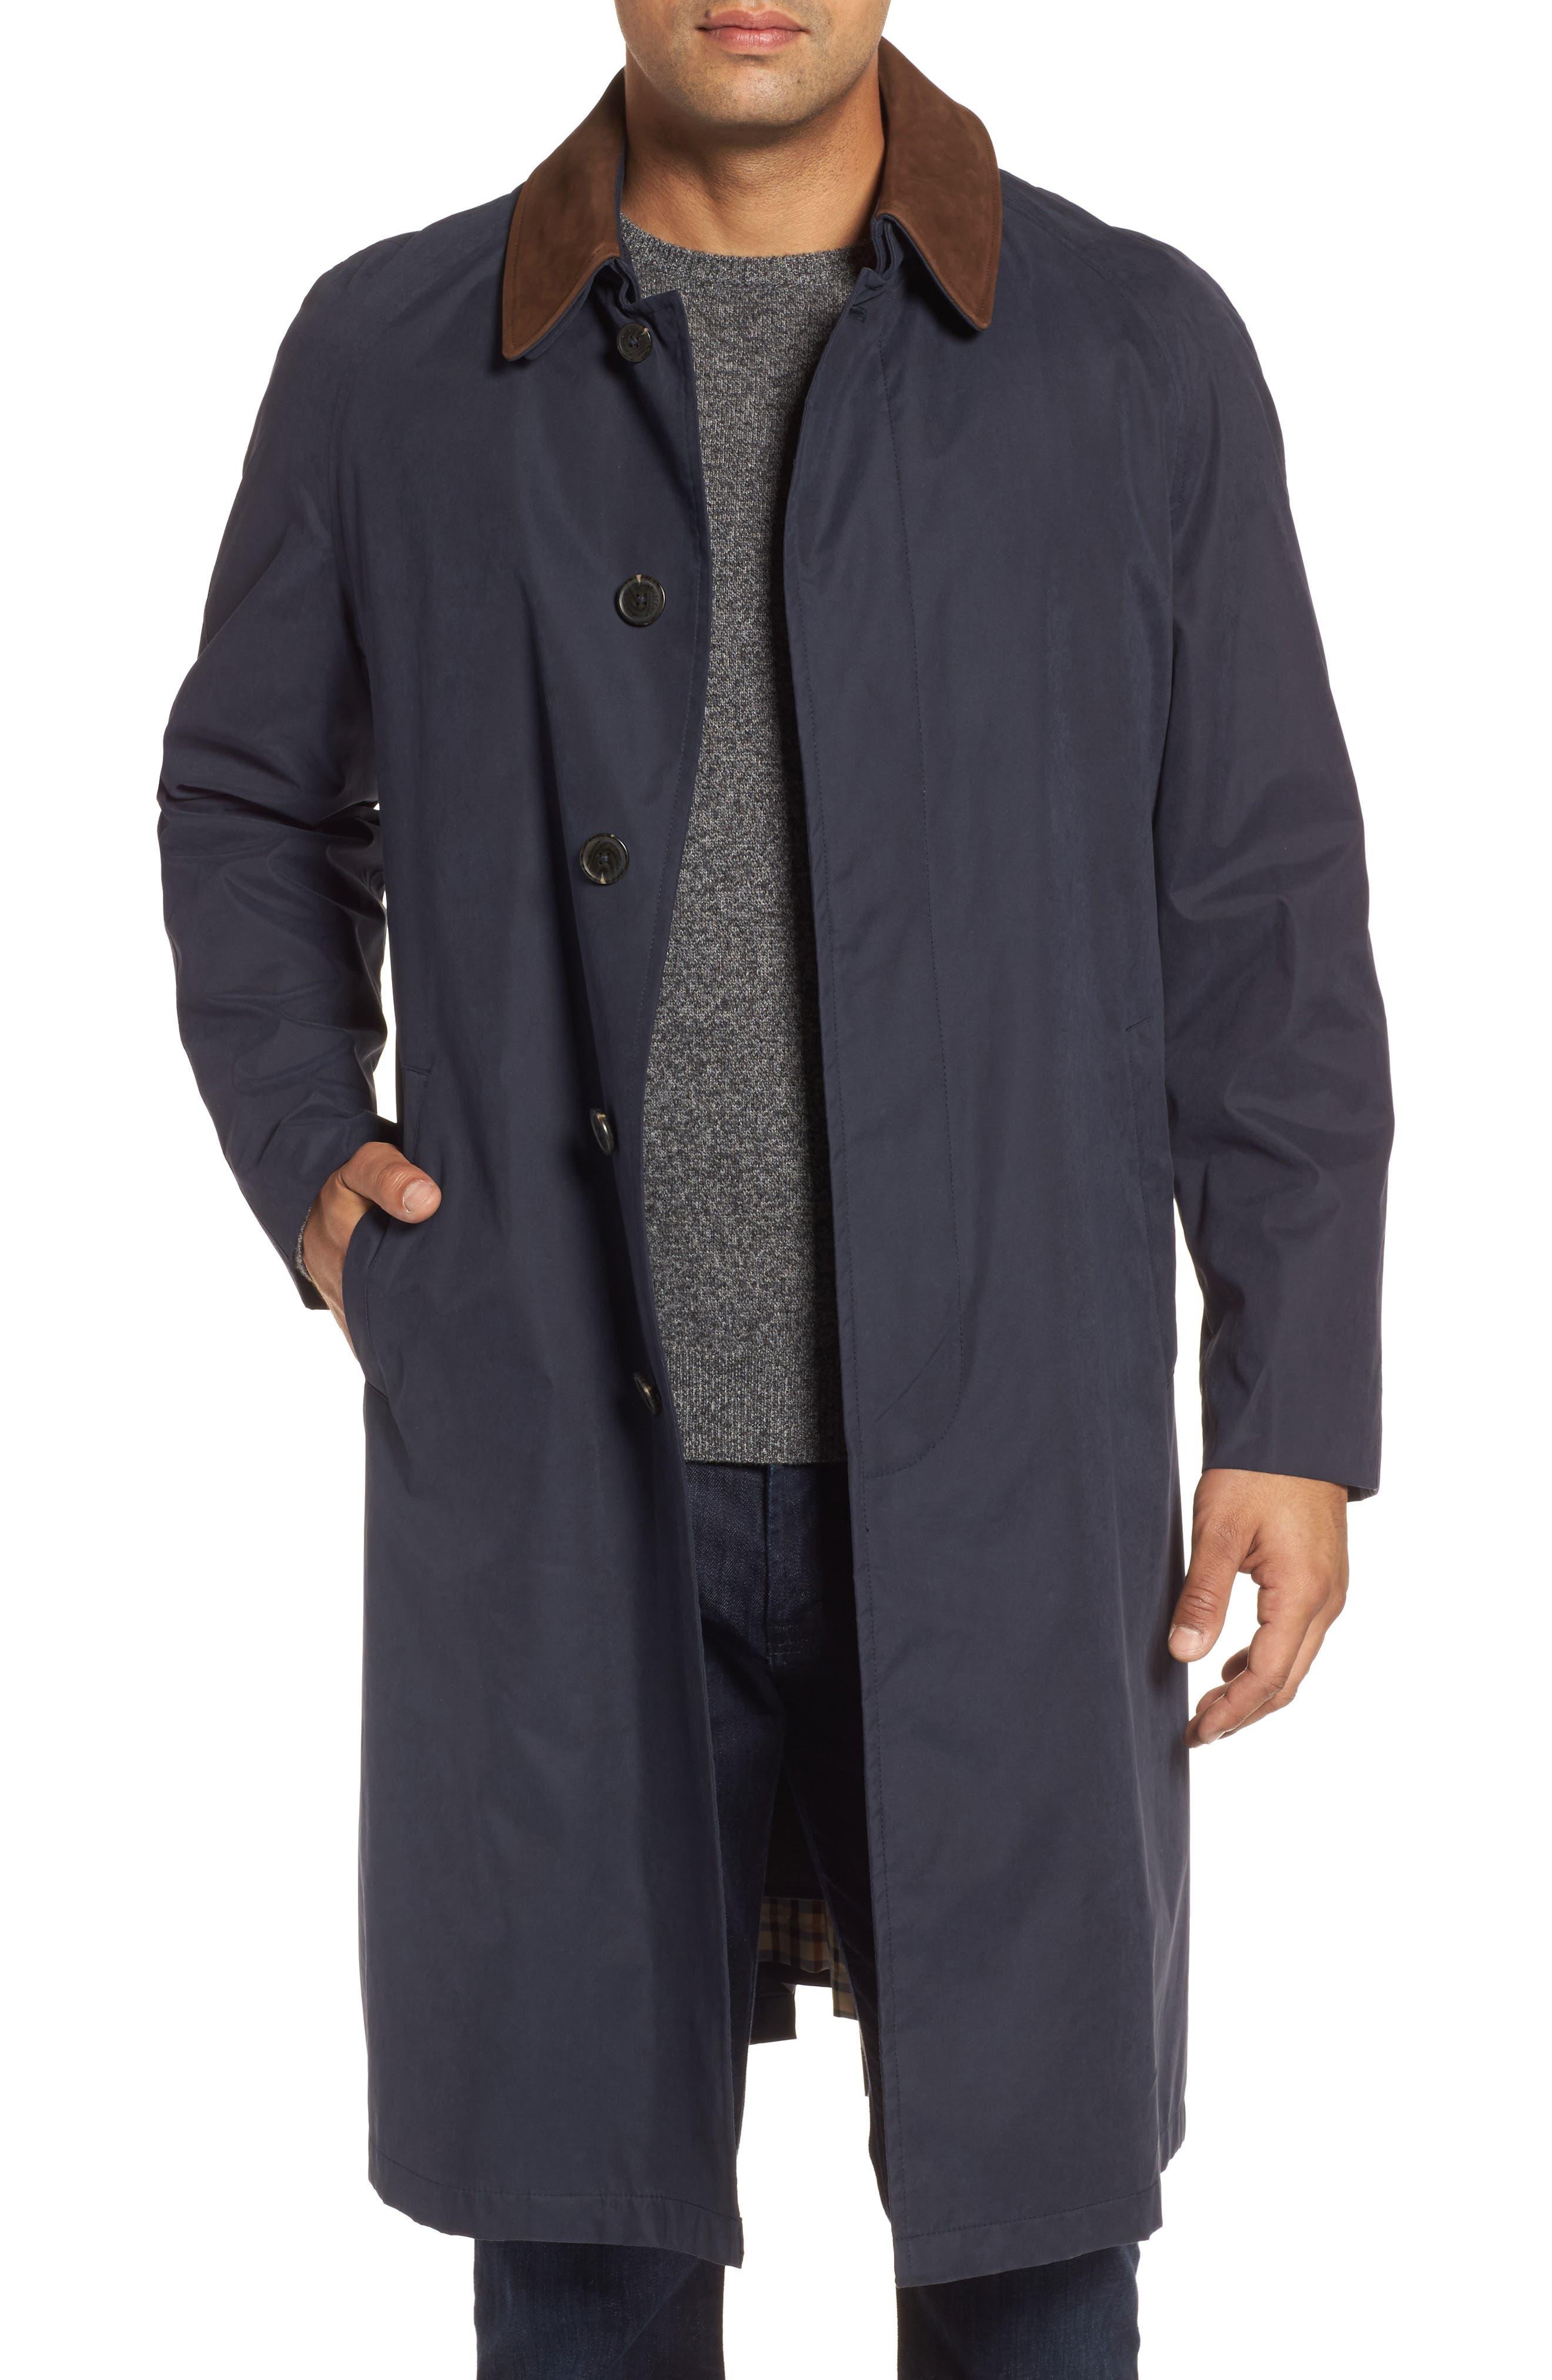 Lawrence Classic Fit Rain Coat,                         Main,                         color, Navy